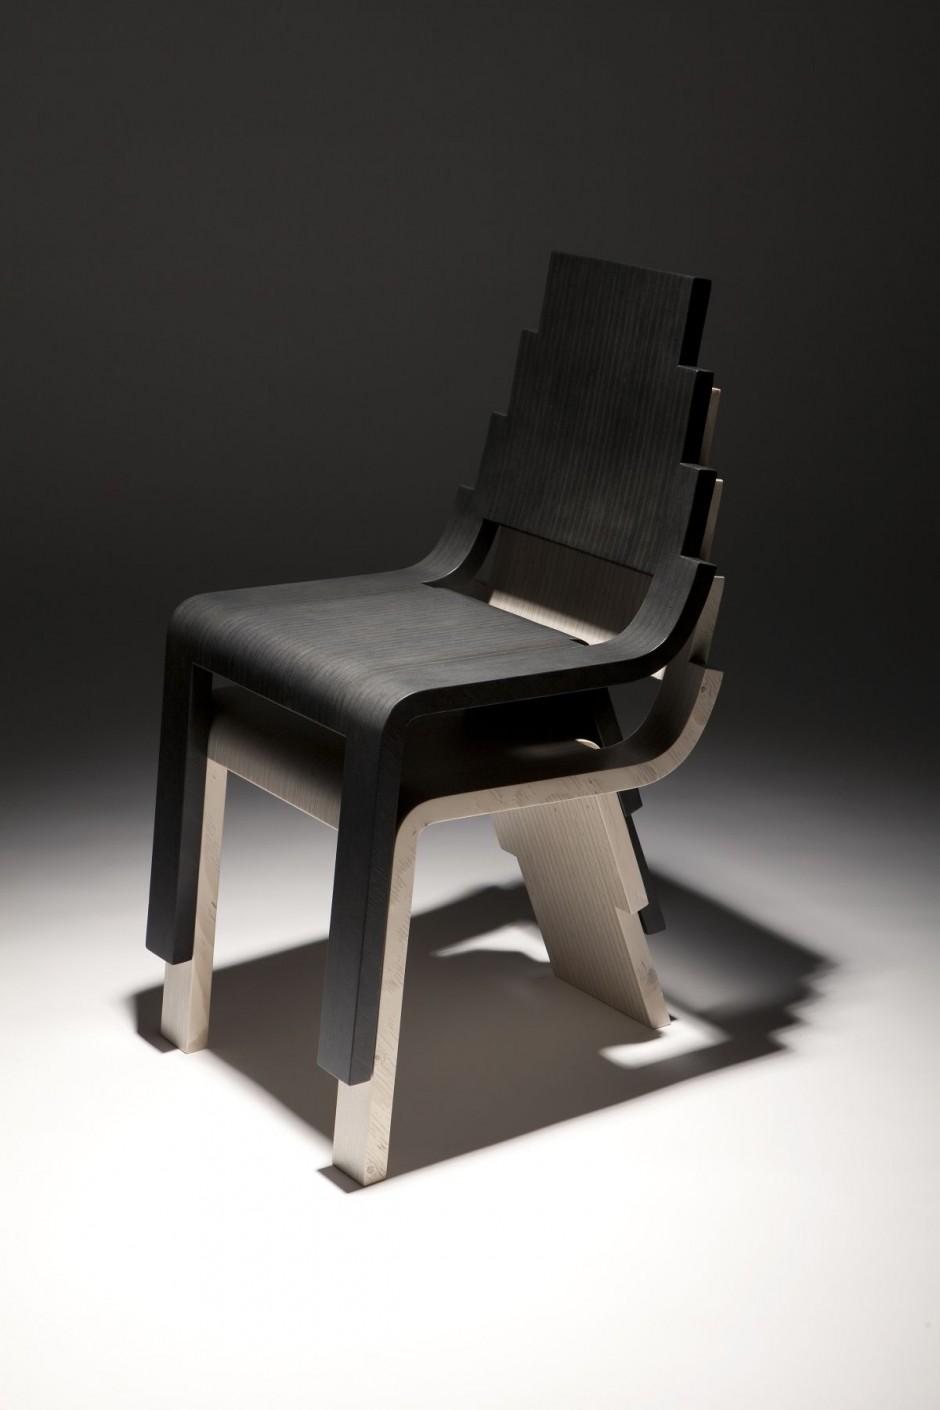 Karim Rashid Furniture Furniture The High Roller And Maya Chairs By Karim Rashid For